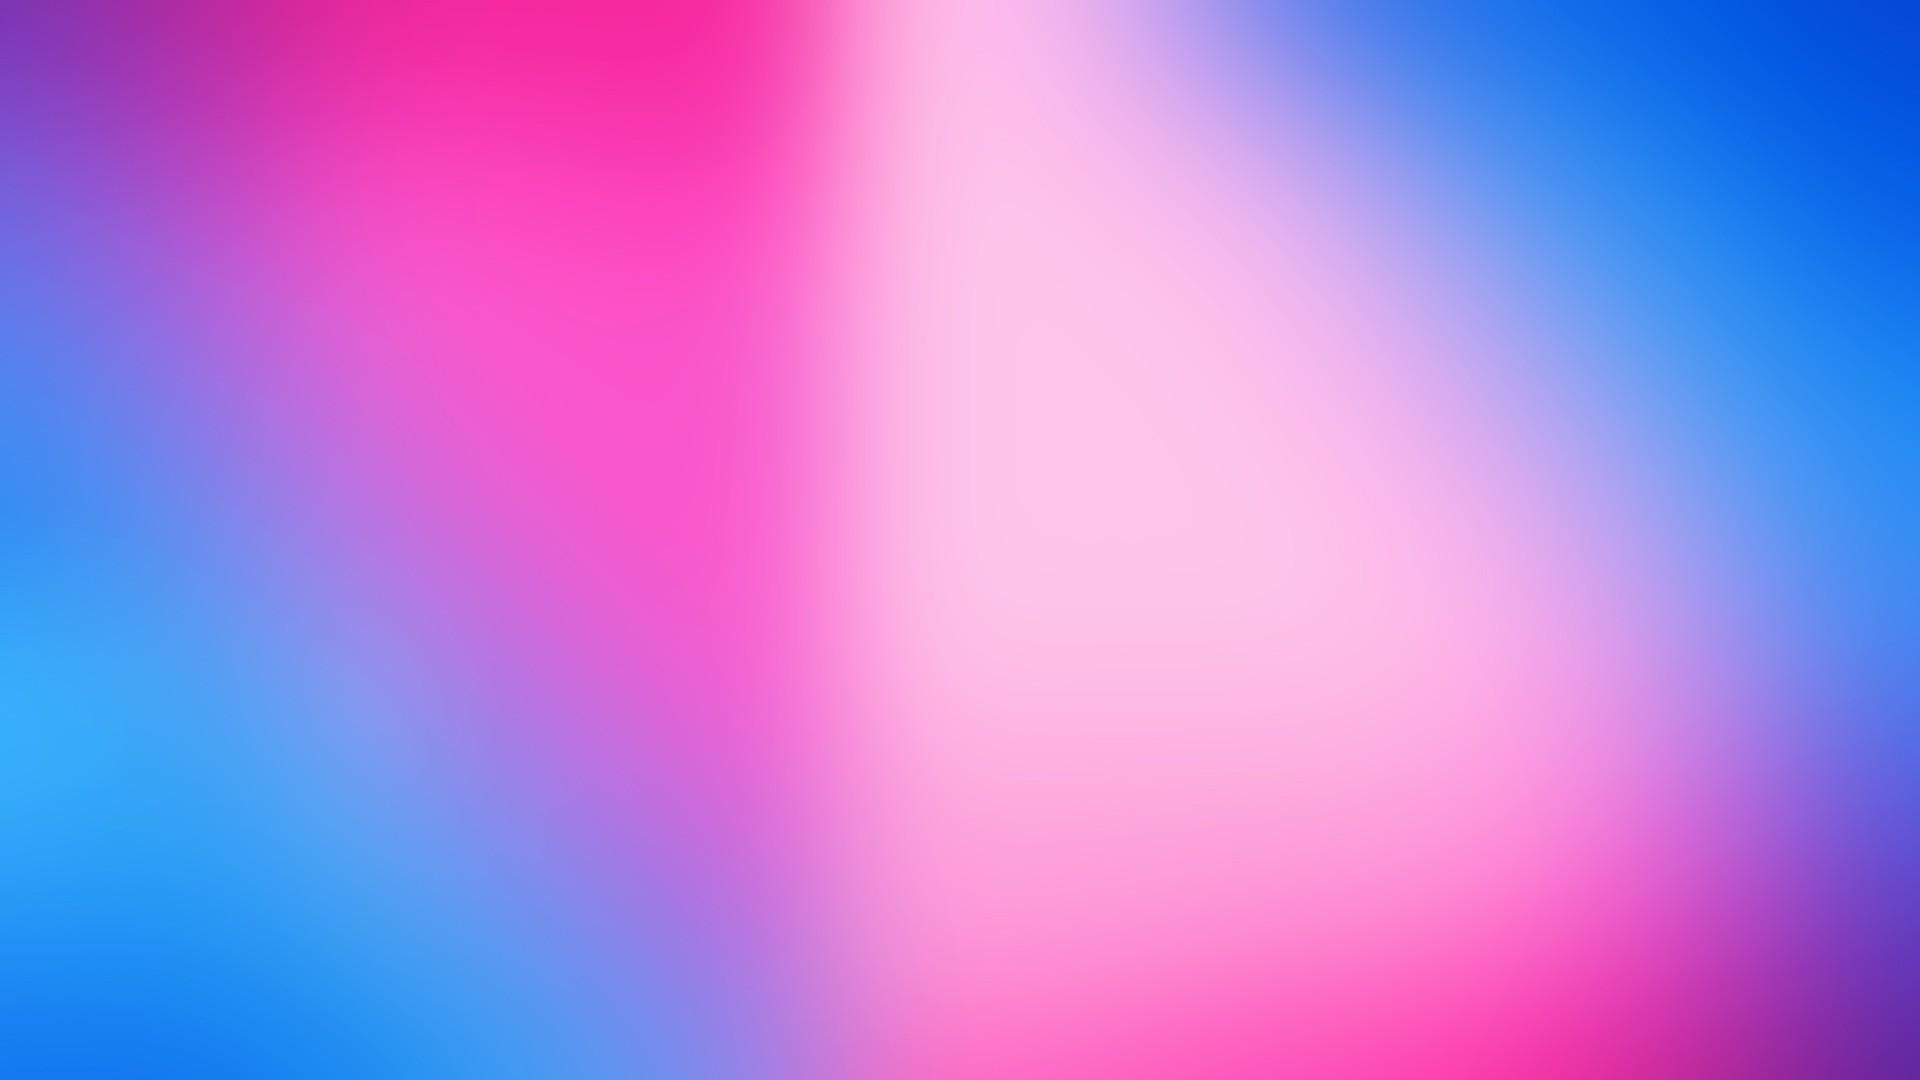 Pink Purple Blue Wallpaper (72+ images)